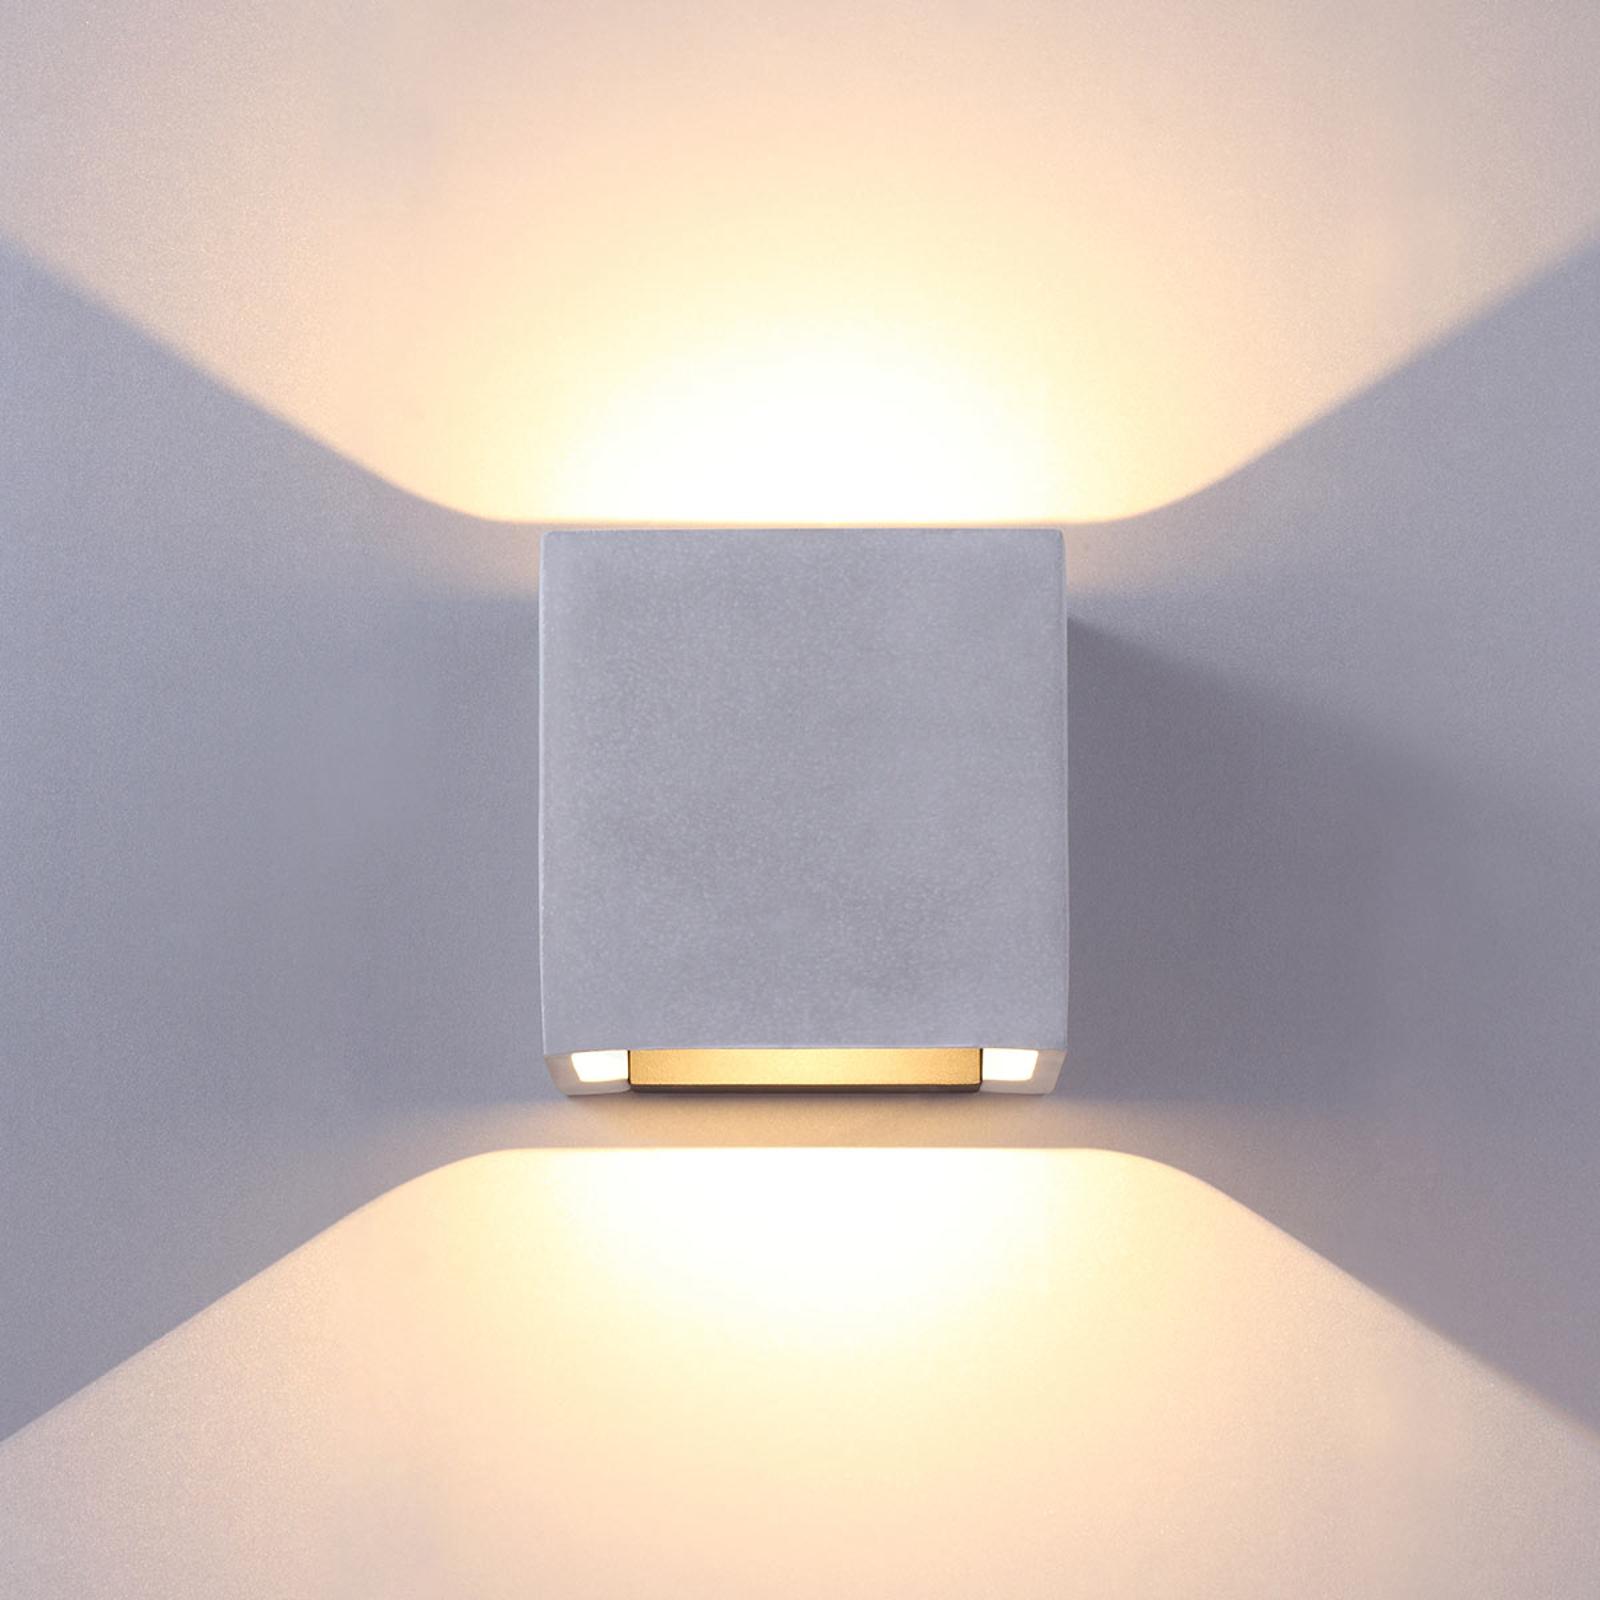 Betongraue LED-Außenwandlampe Riak